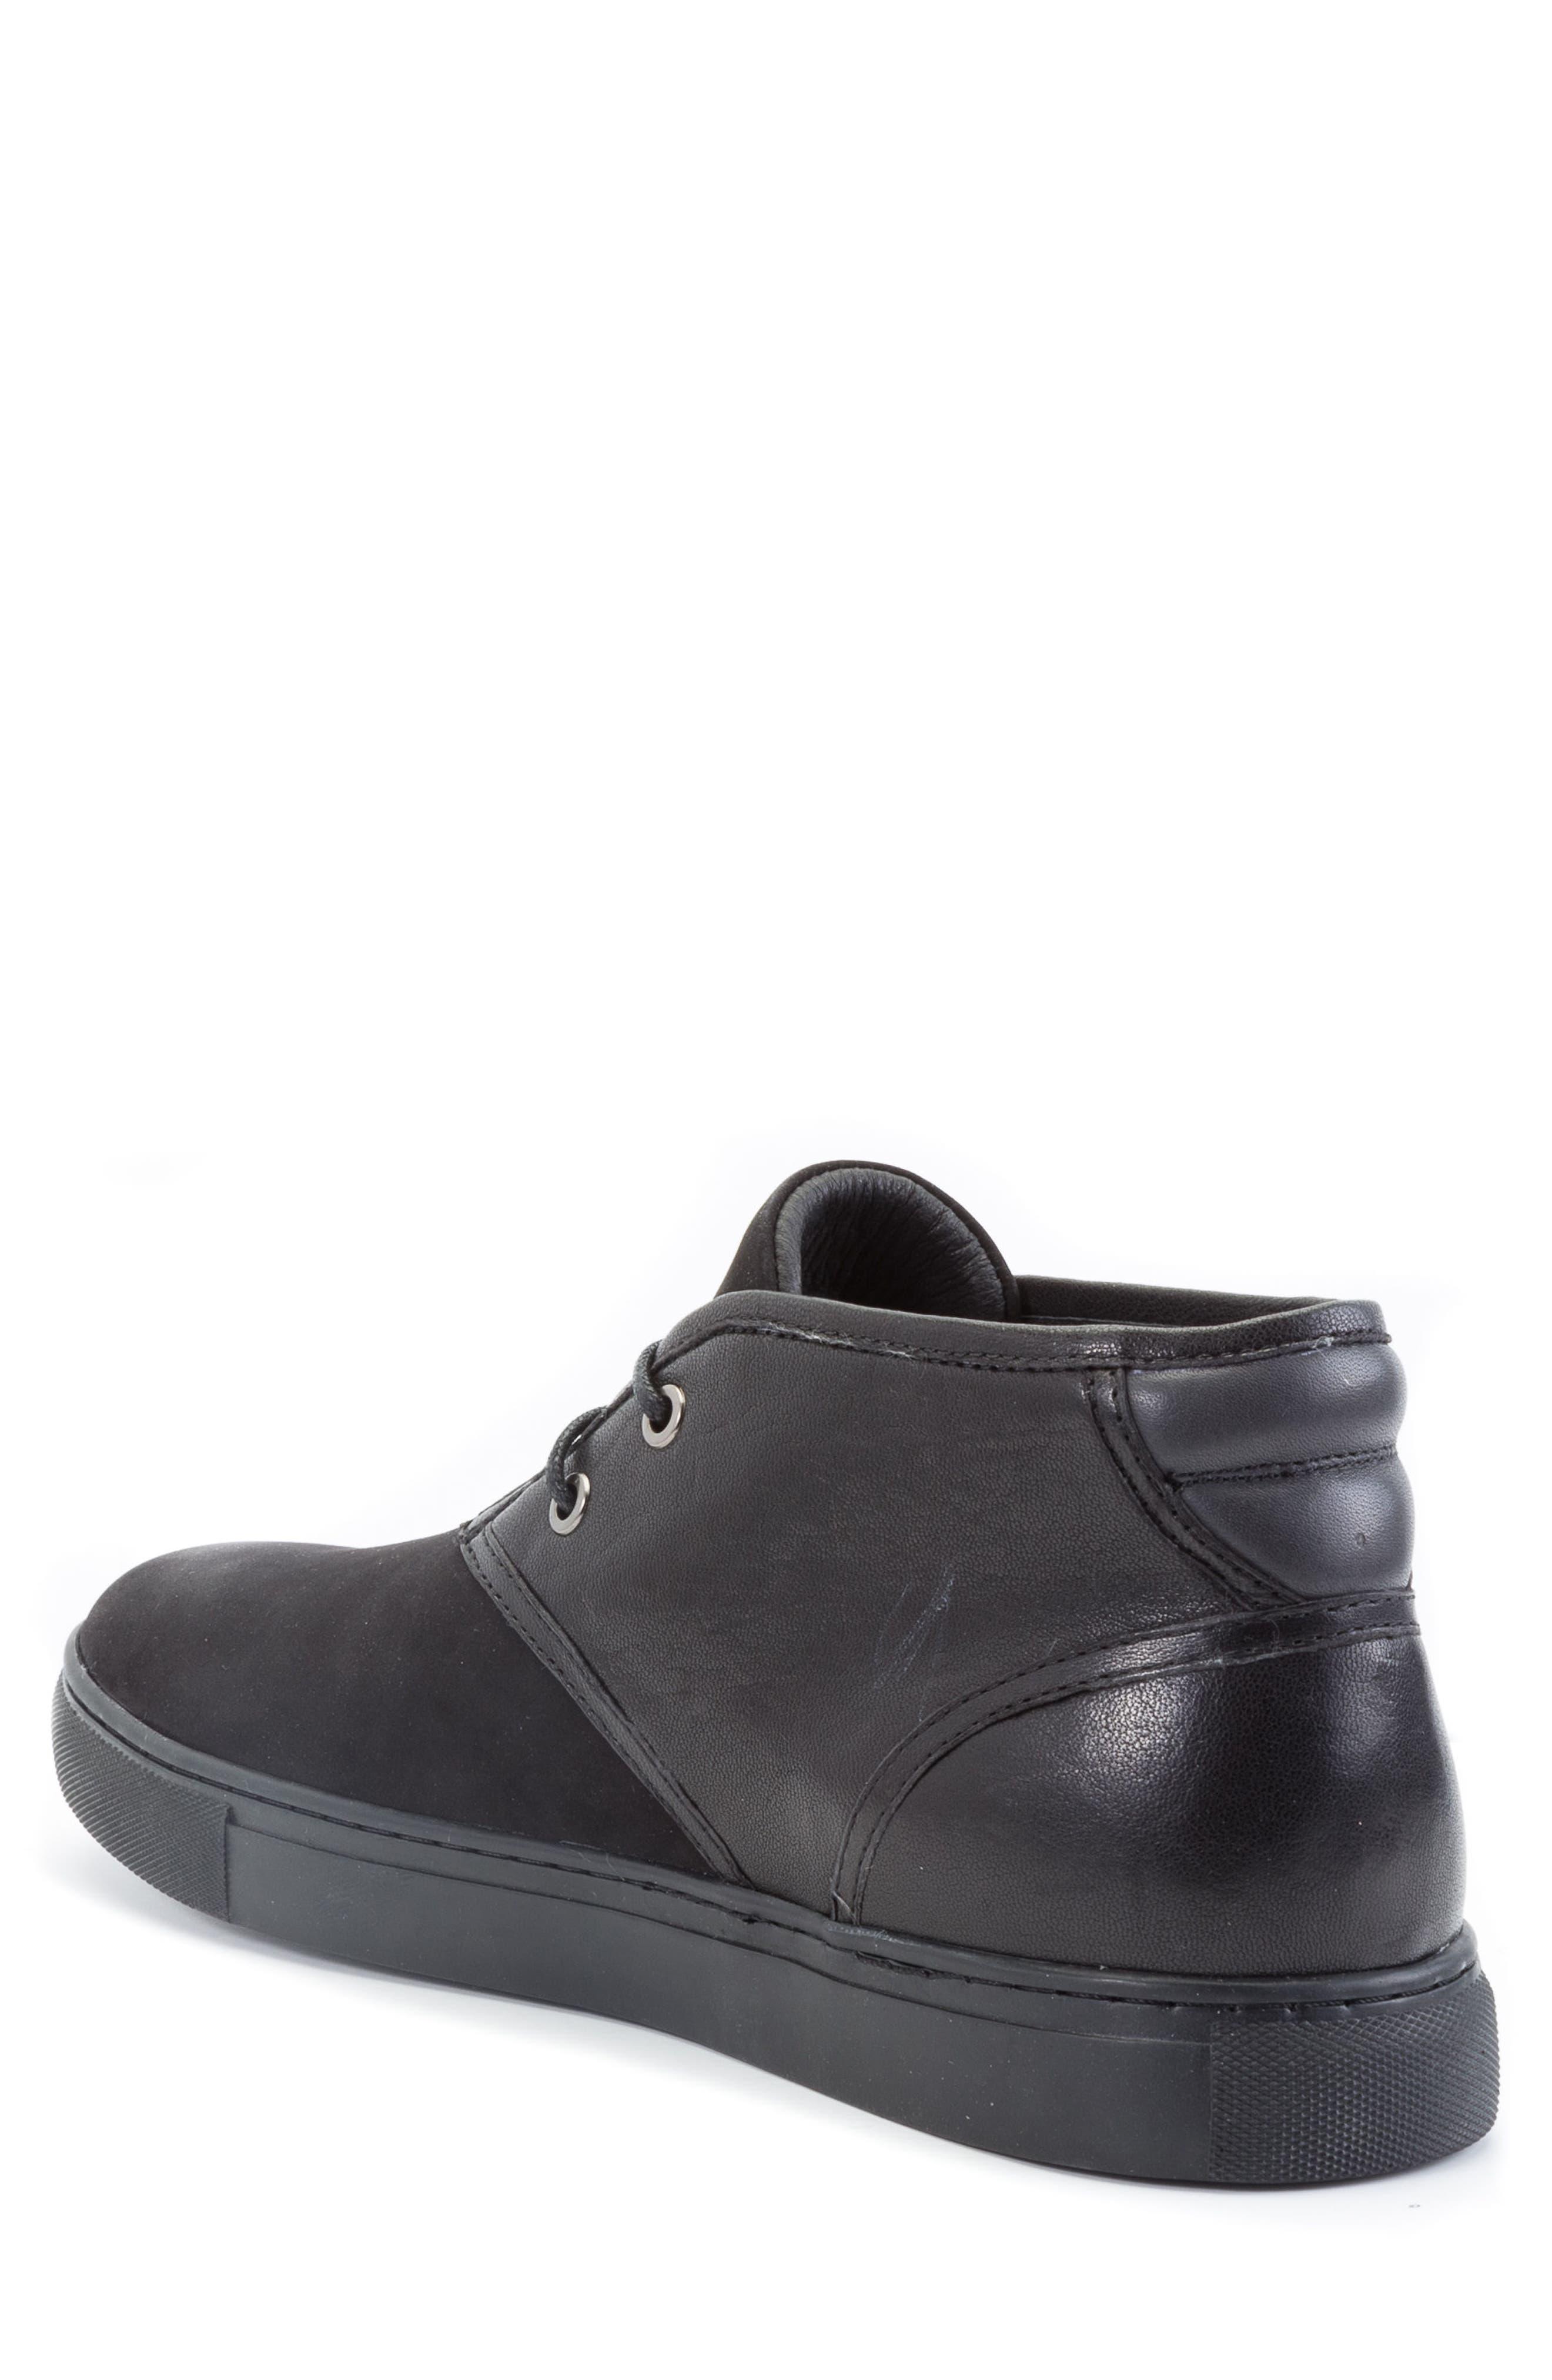 Catlett Chukka Sneaker,                             Alternate thumbnail 2, color,                             Black Suede/ Leather